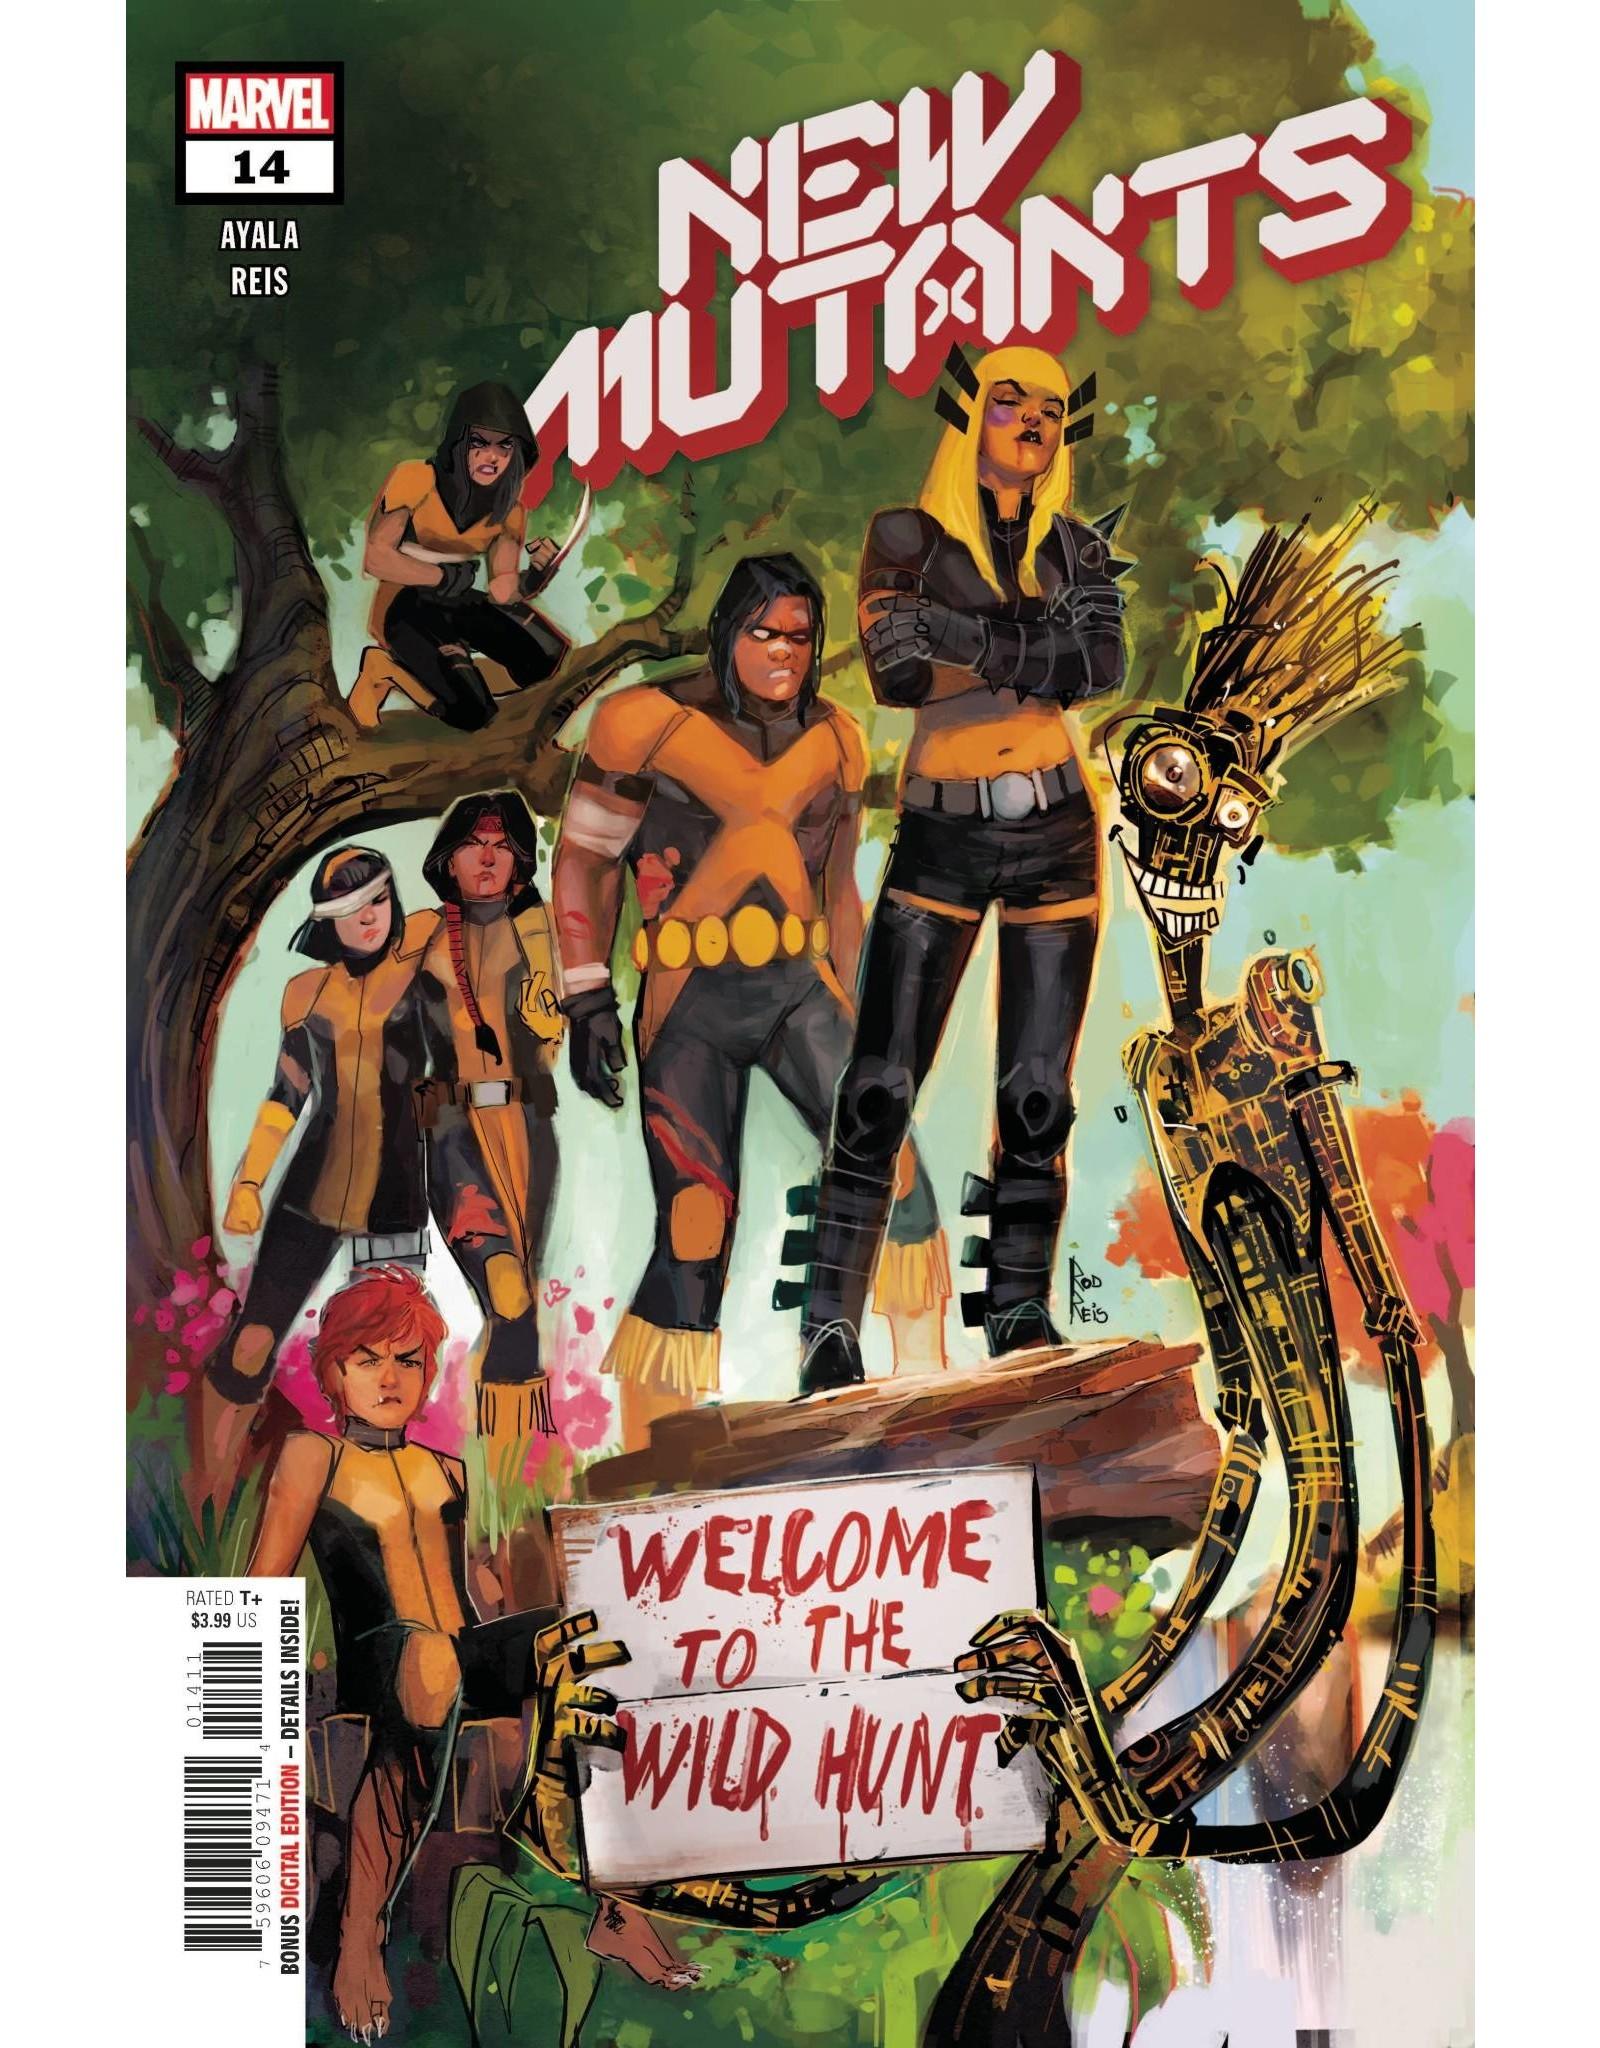 Marvel Comics NEW MUTANTS #14